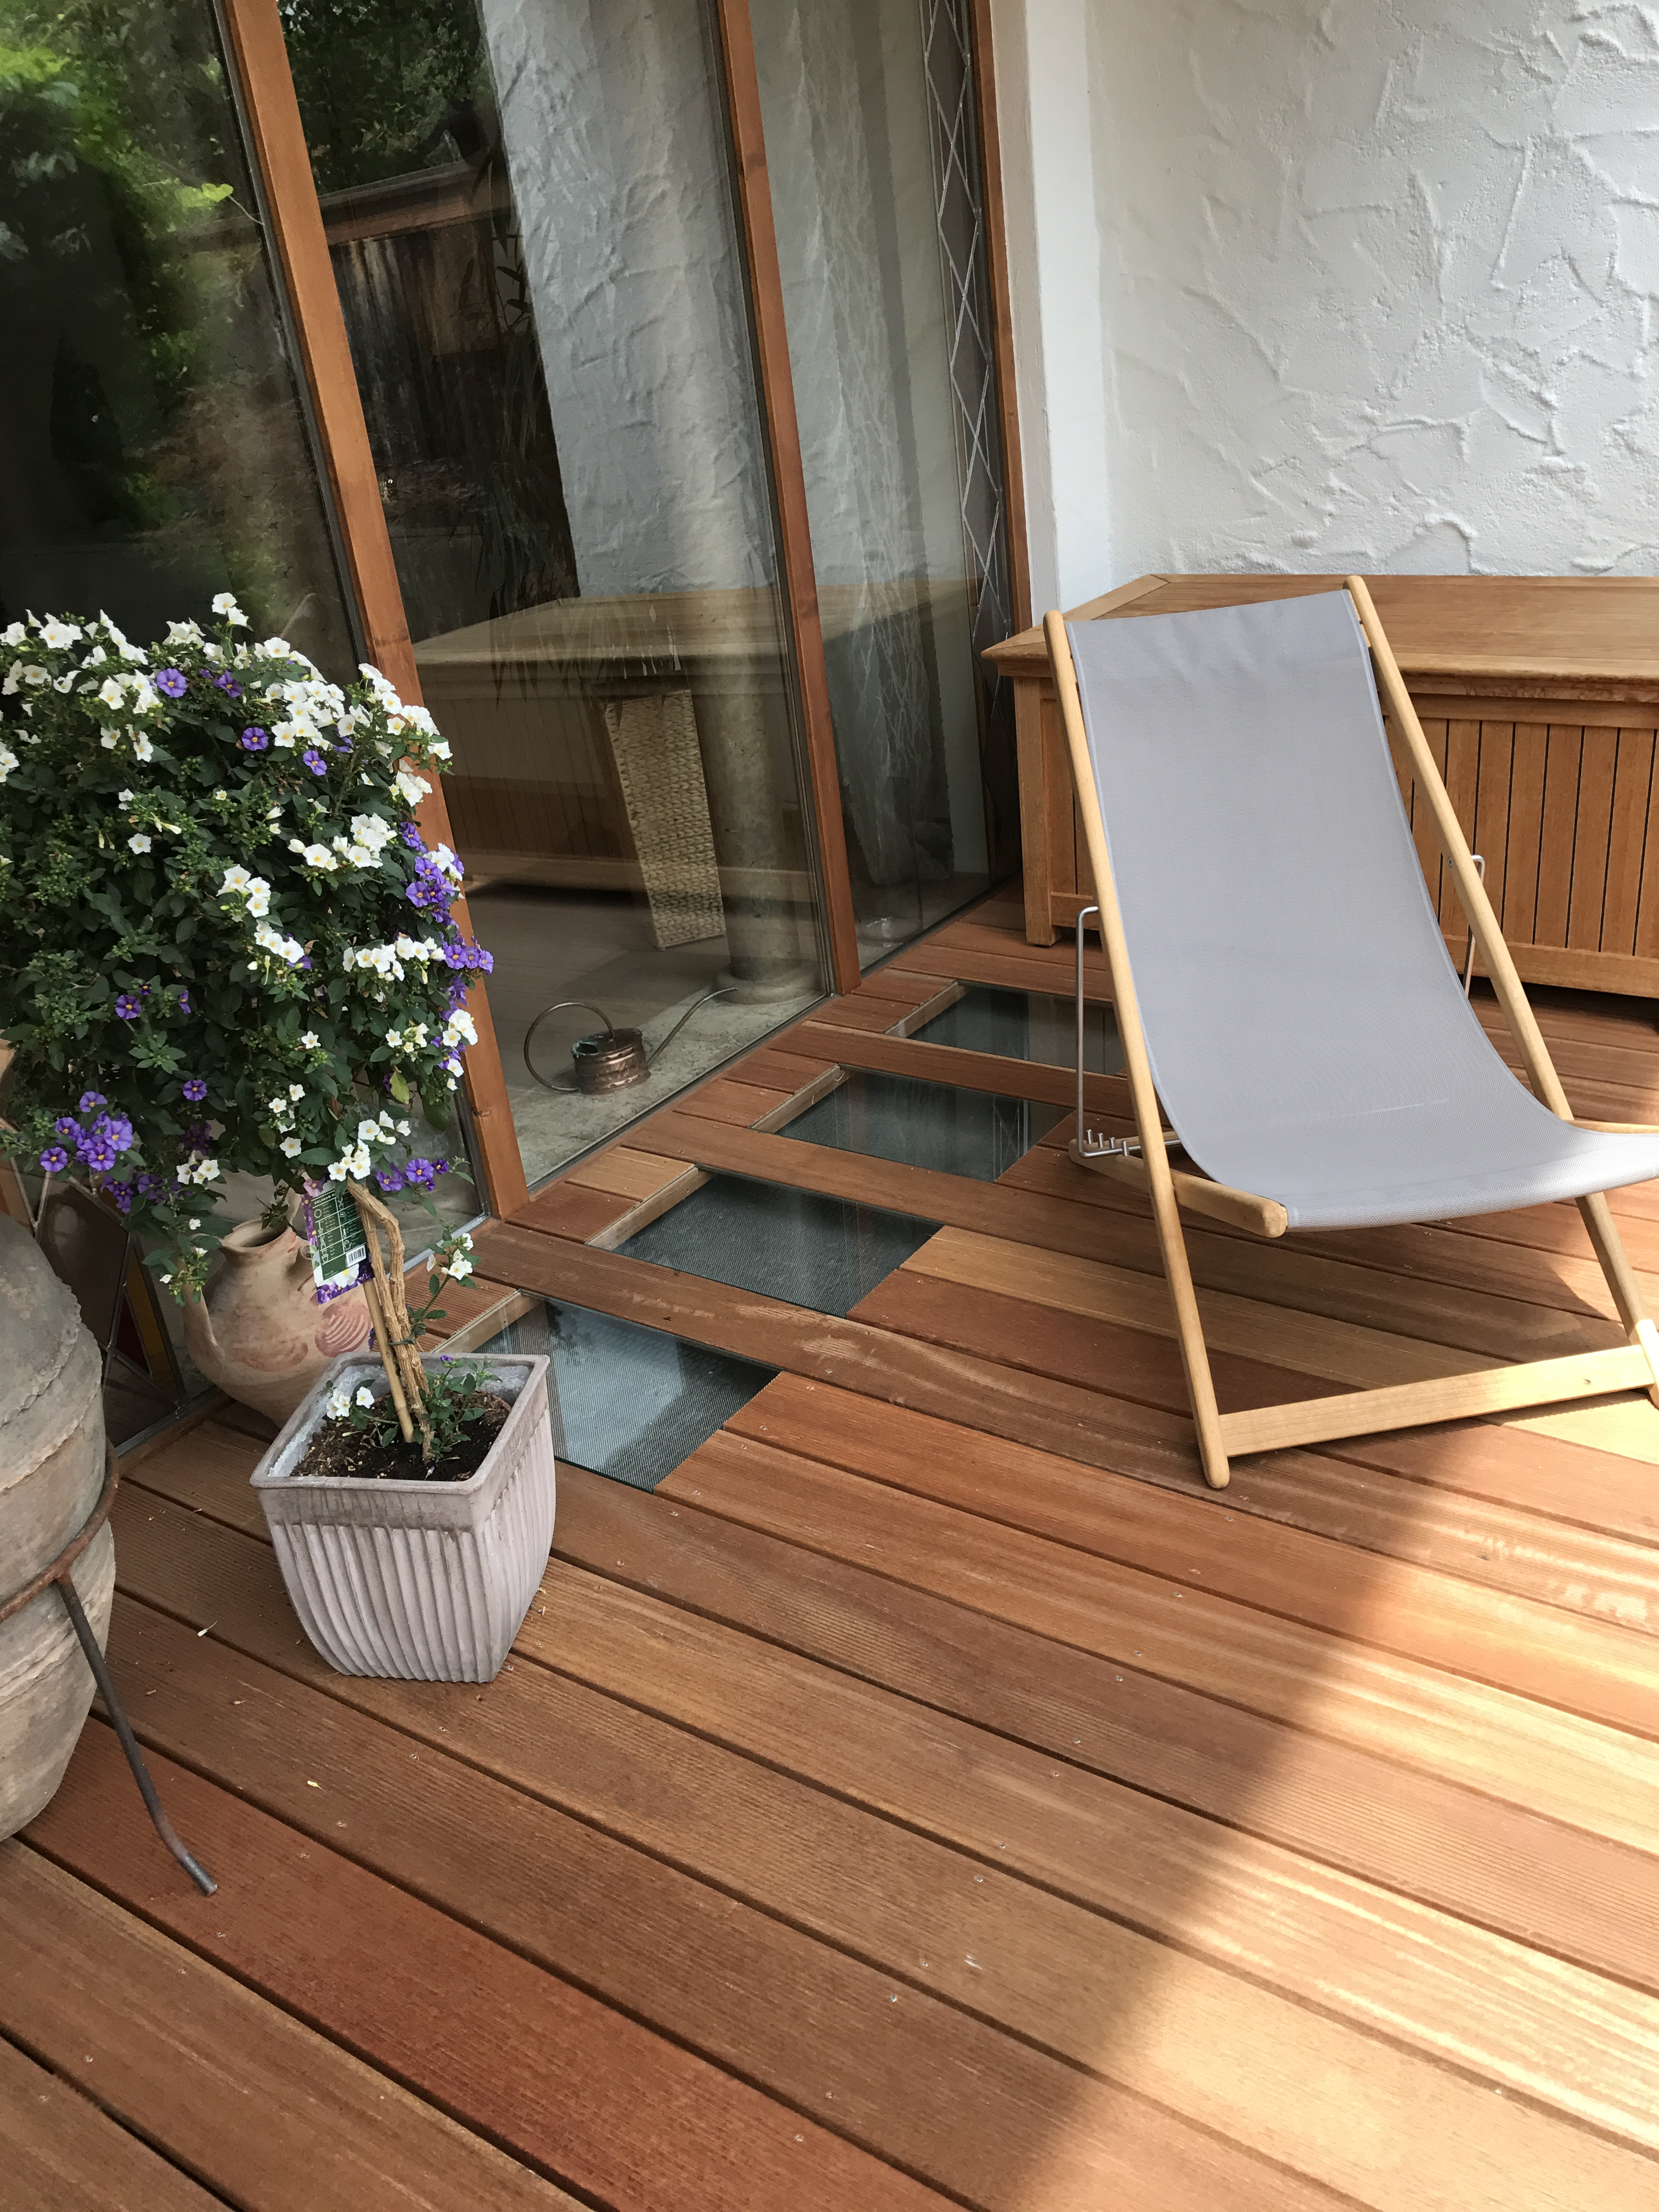 edle terrasse aus holz zimmerei lenk zimmerei. Black Bedroom Furniture Sets. Home Design Ideas